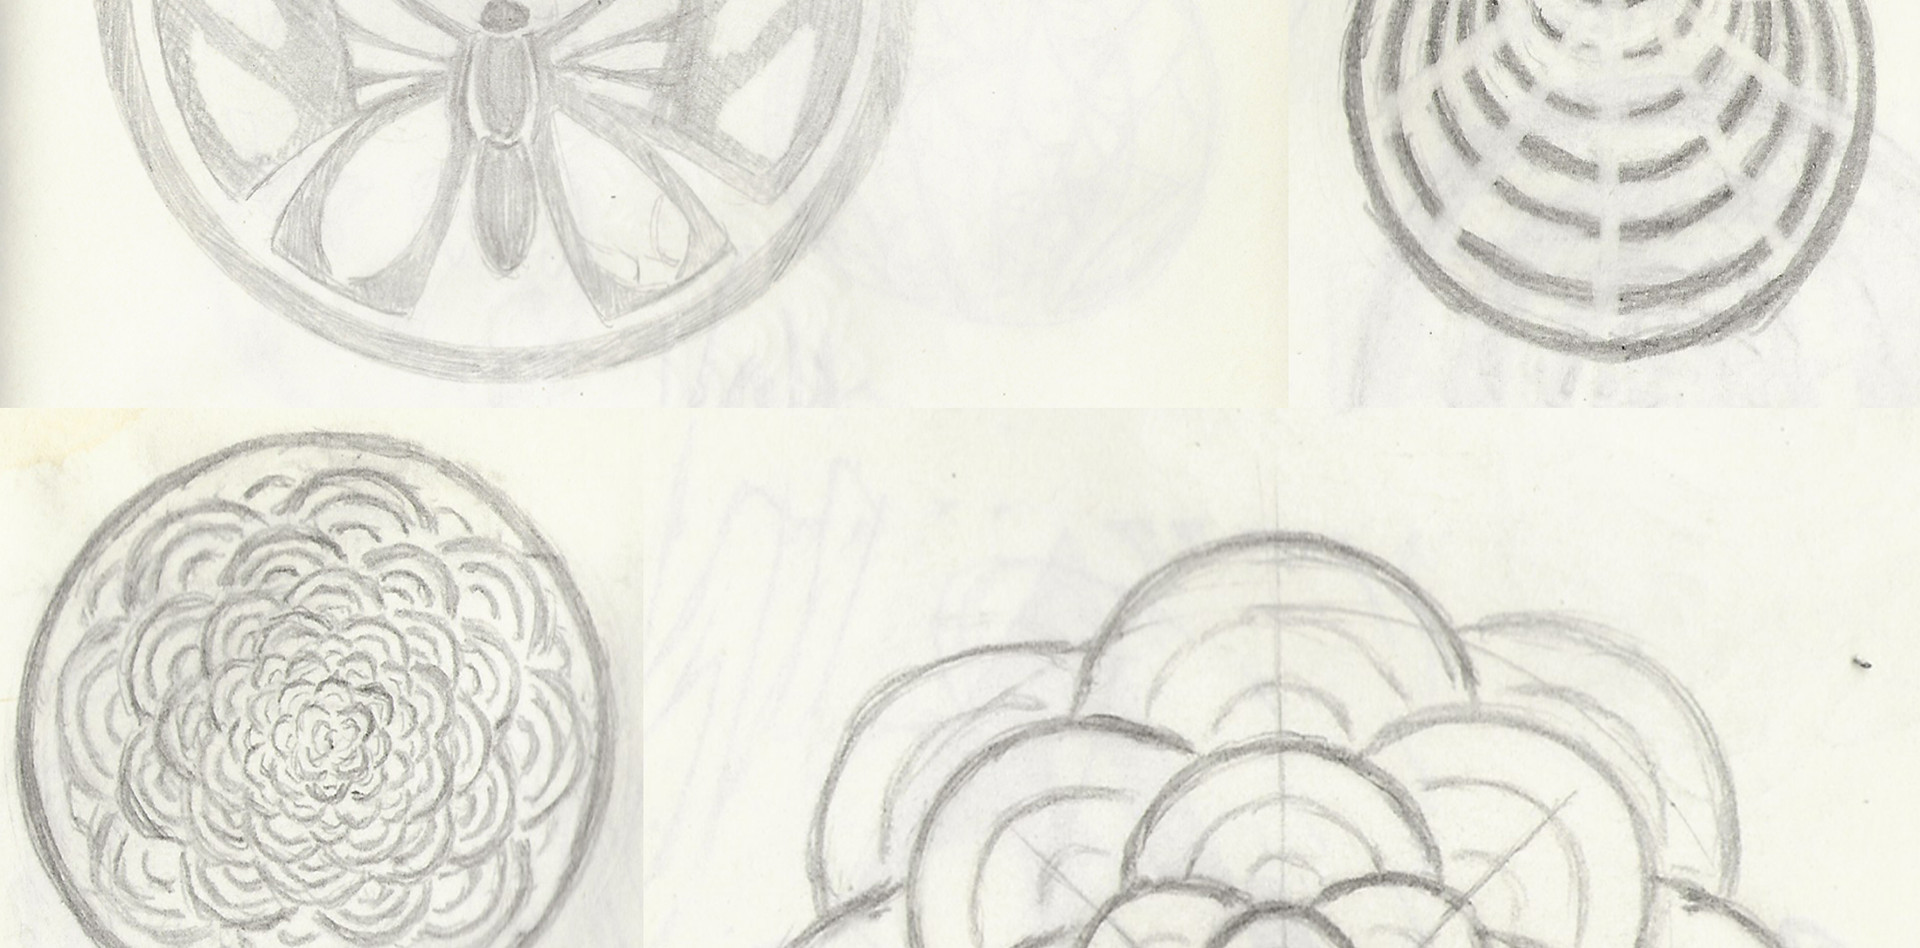 webs of well-being logo design (2/3)